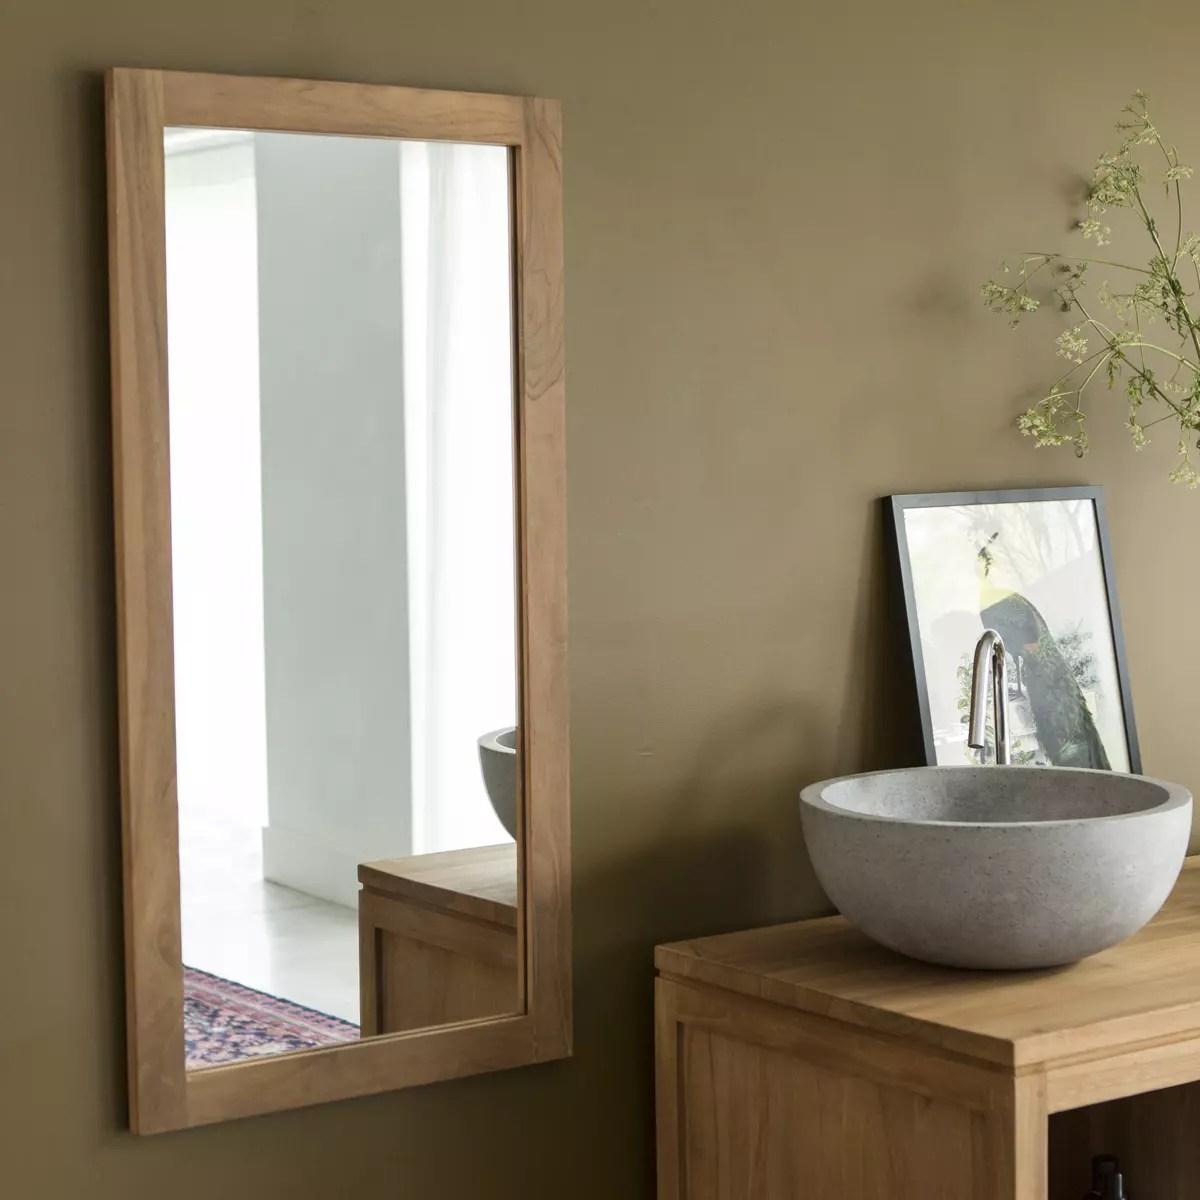 Miroir En Teck 100 X 50 Cm Accessoires Pour Salle De Bain Tikamoon